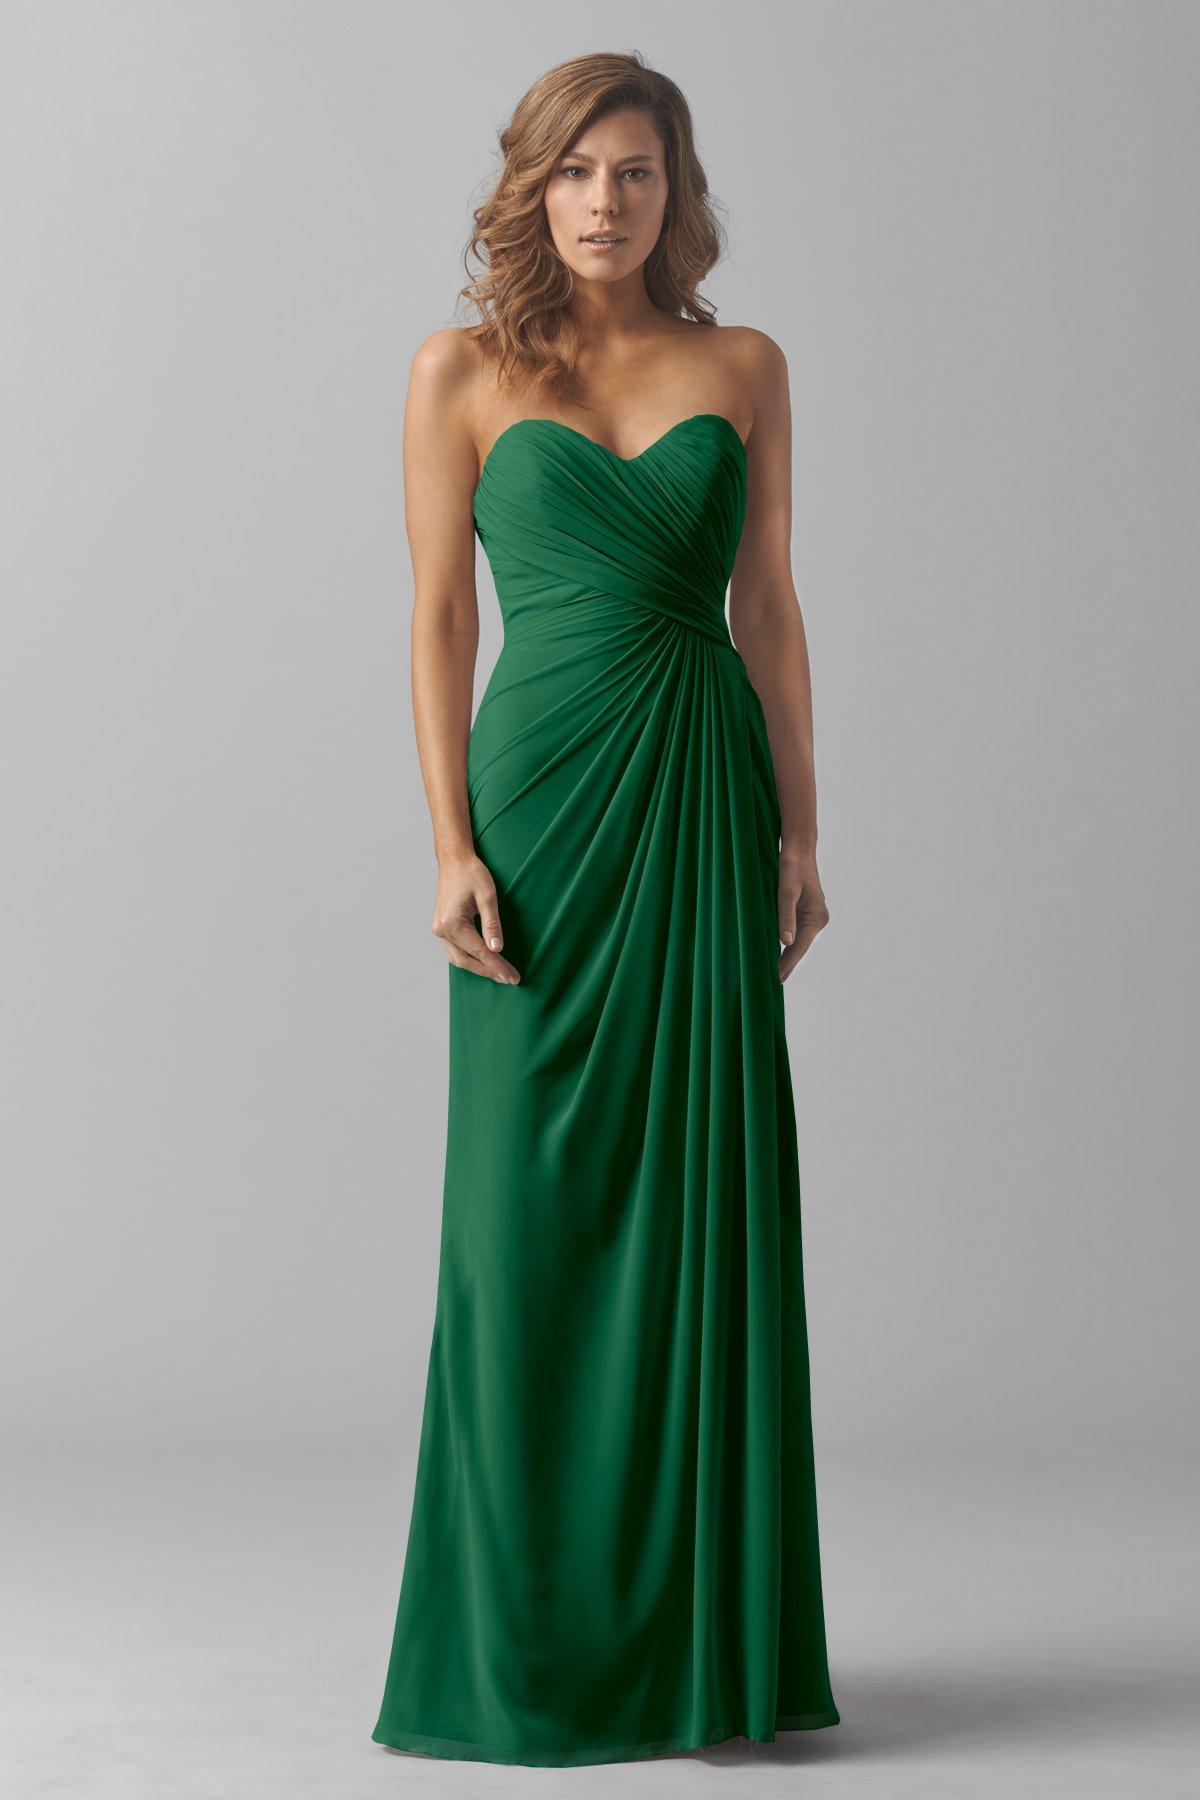 Emerald Green Seath Long Sweetheart Bridesmaid Dress